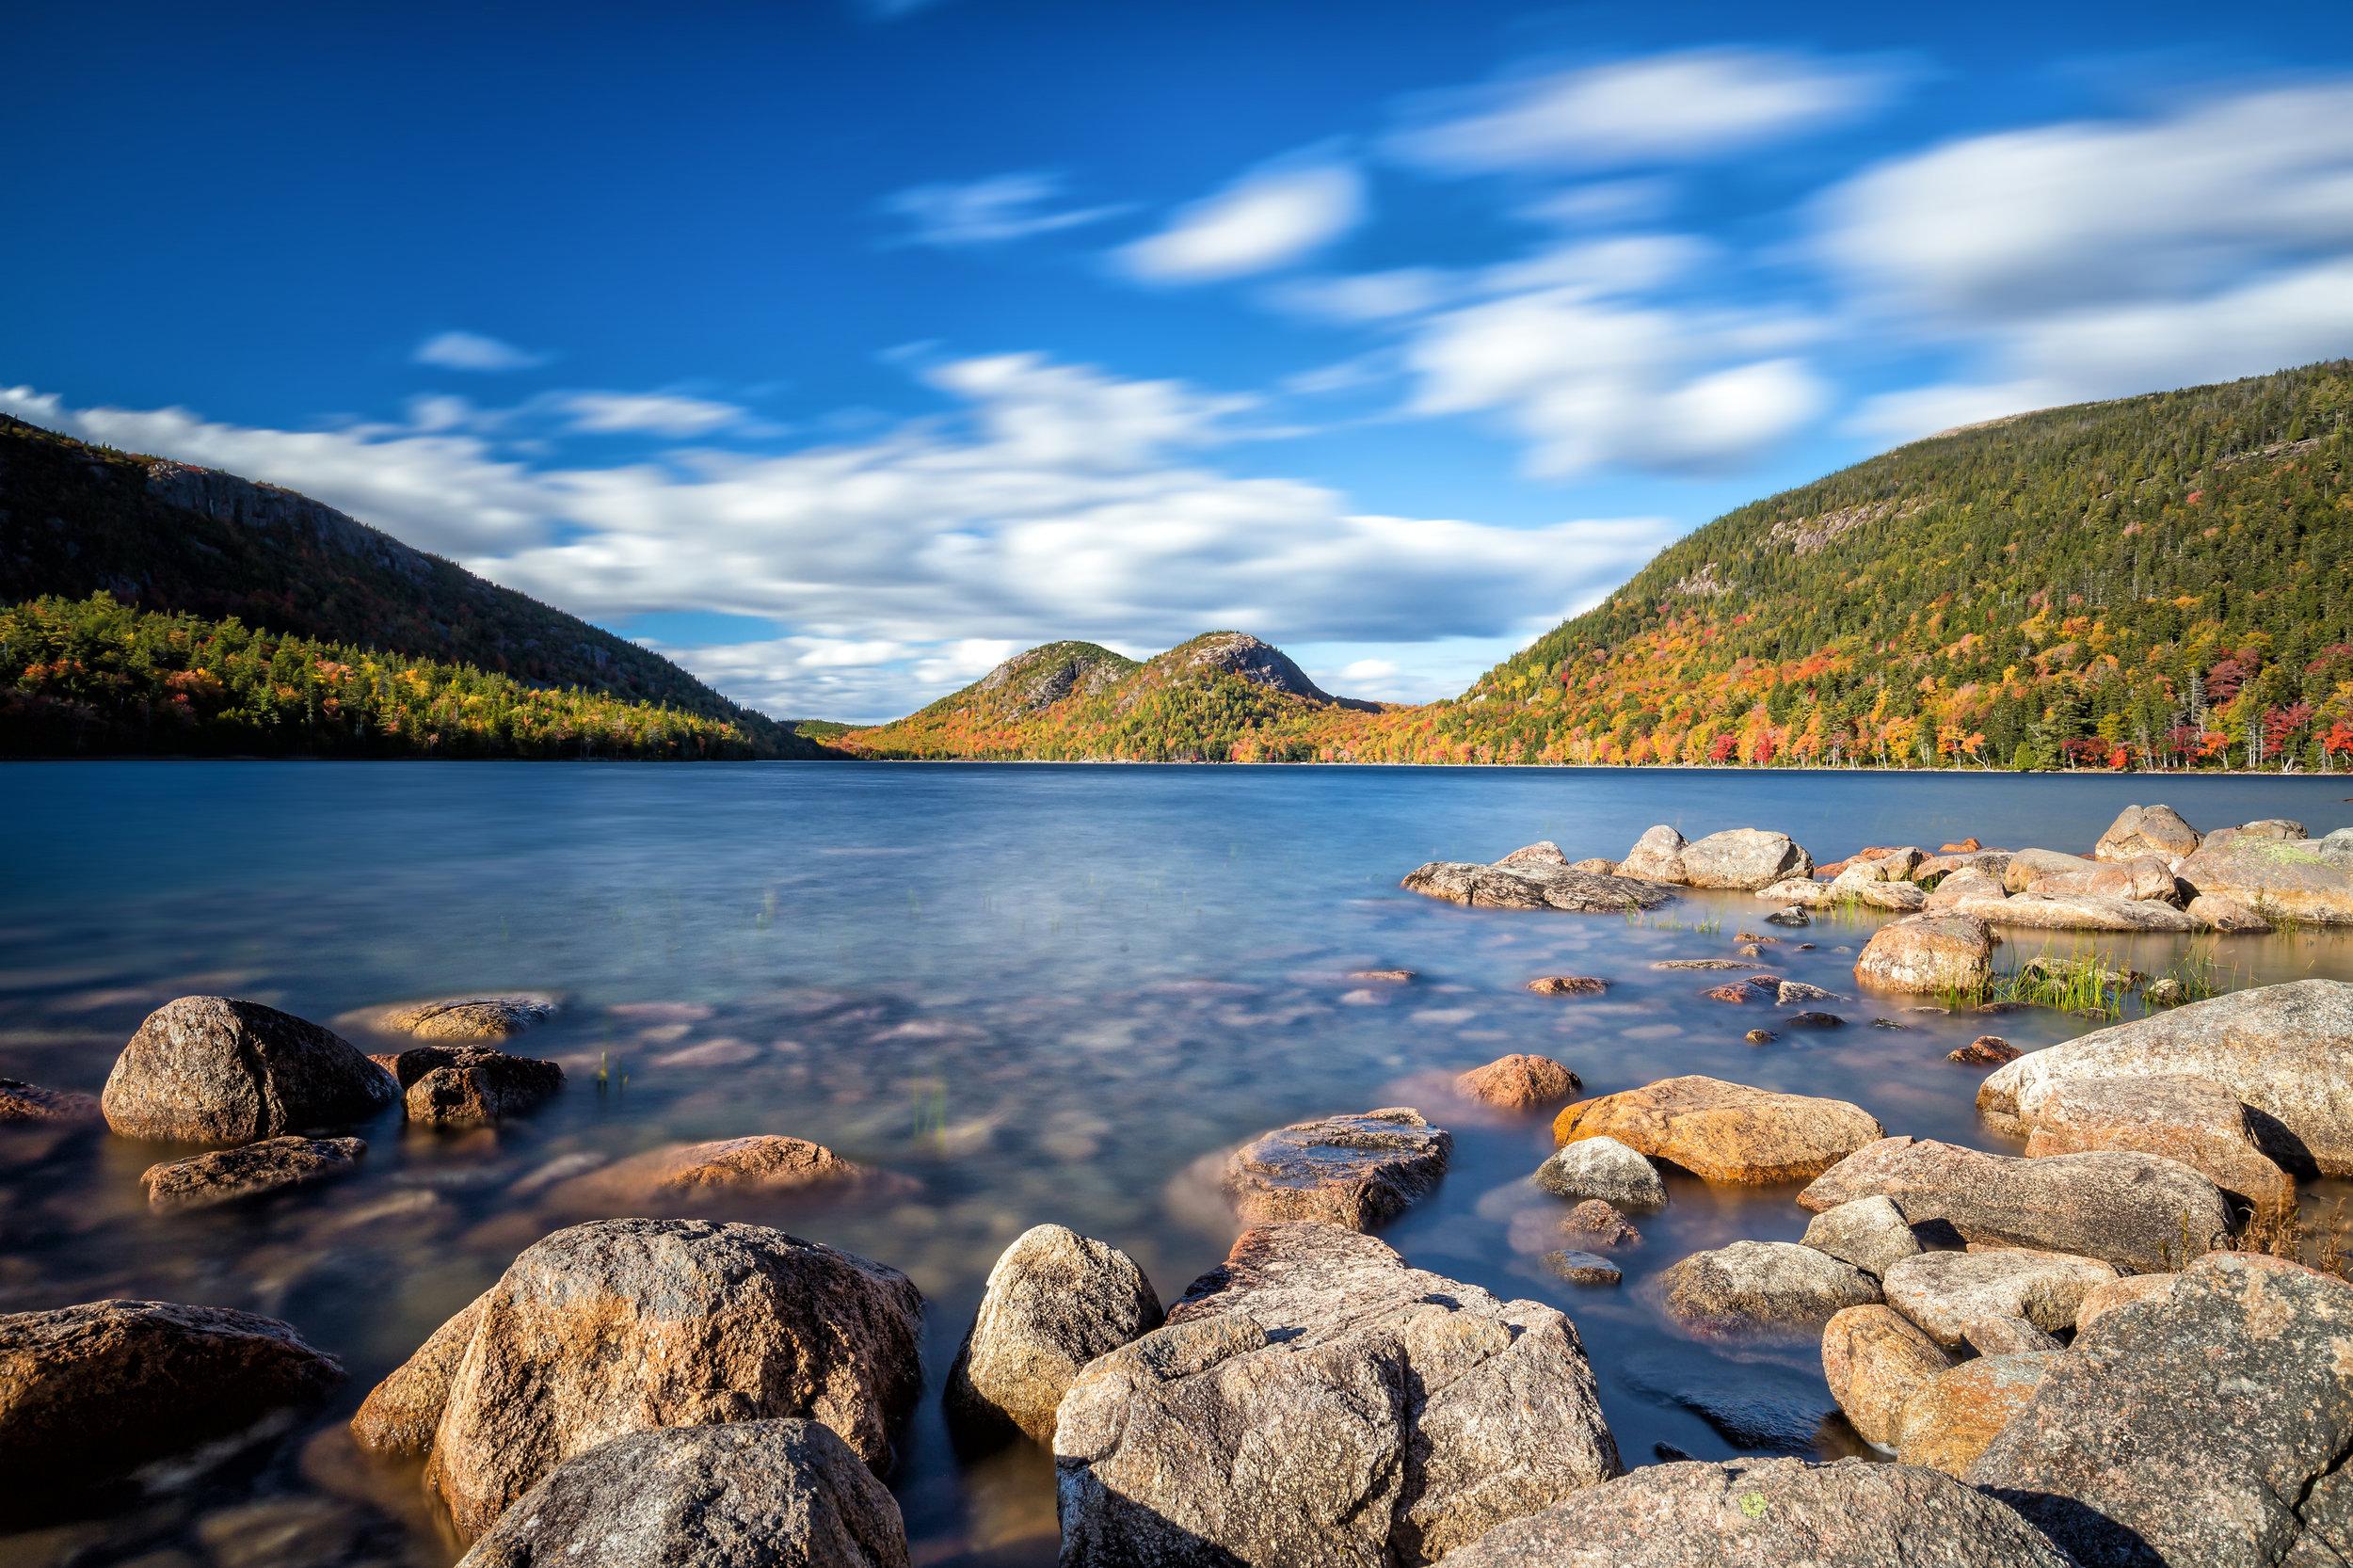 Acadia - Where Sea Meets Mountain